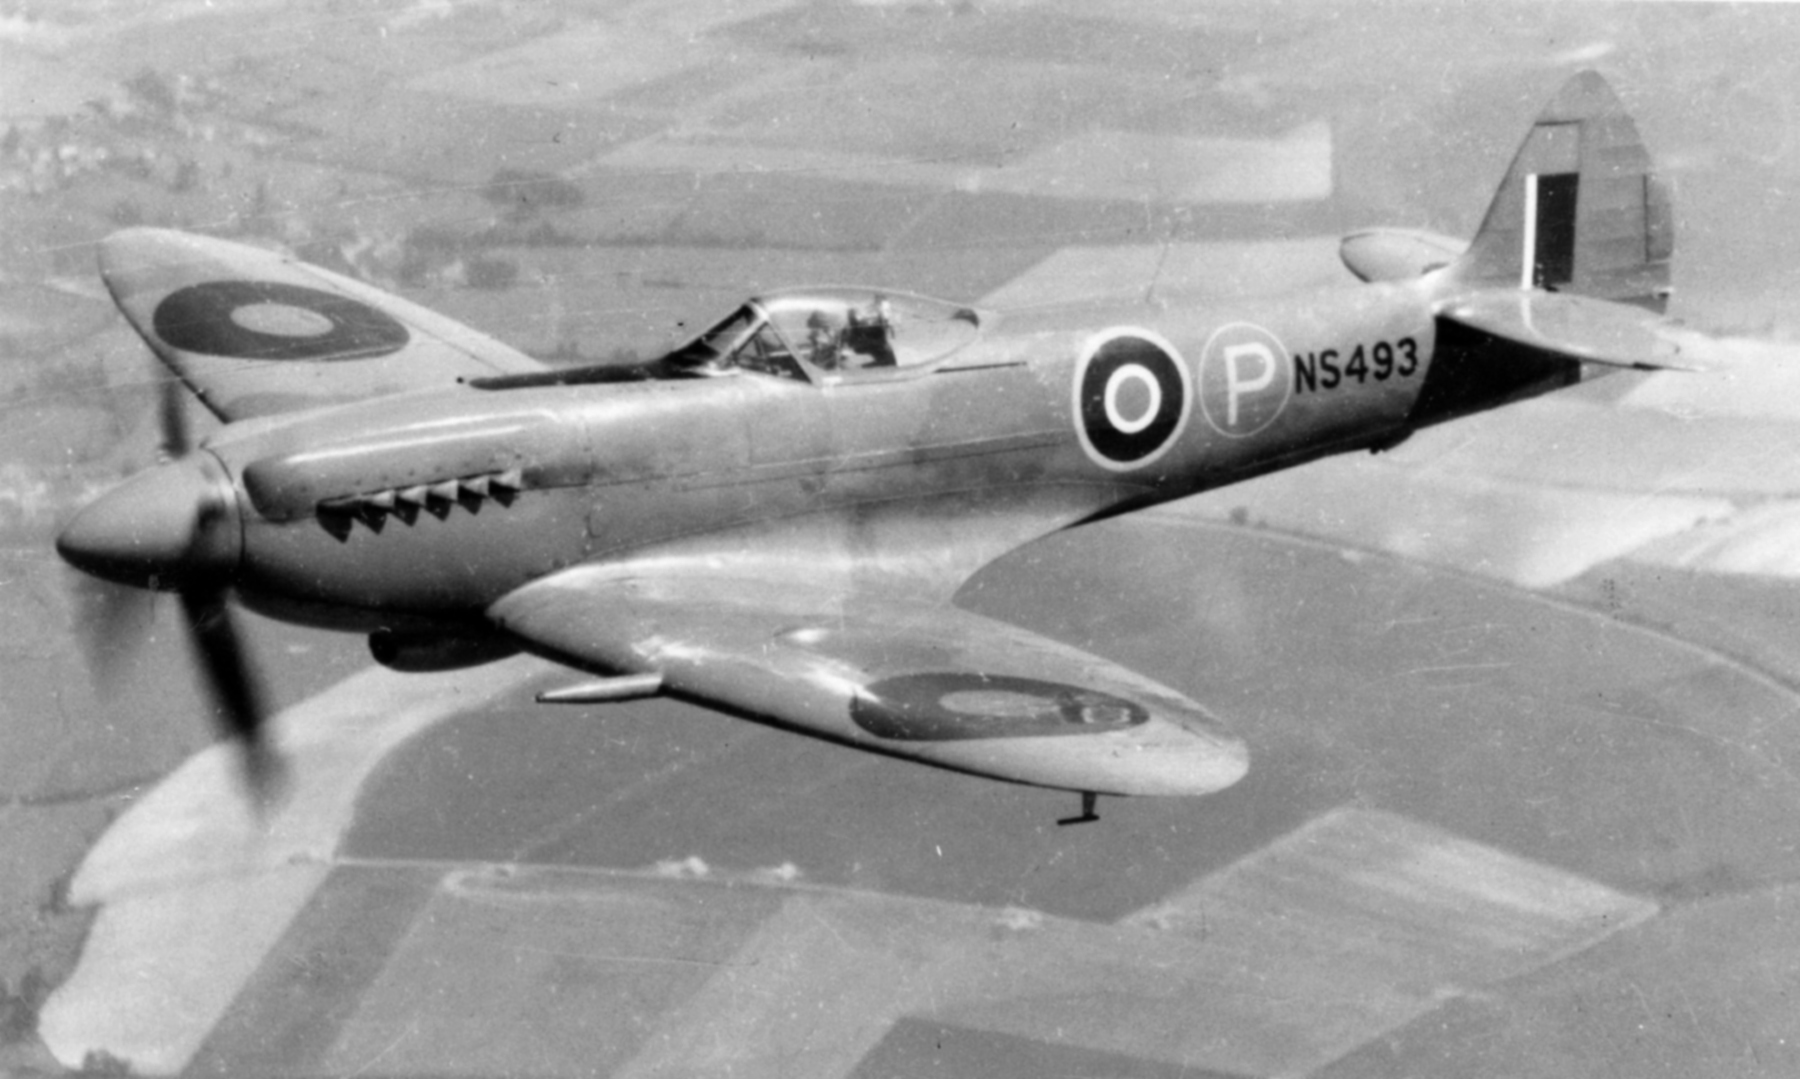 Seafire 17 Prototype NS493 England 1946 01